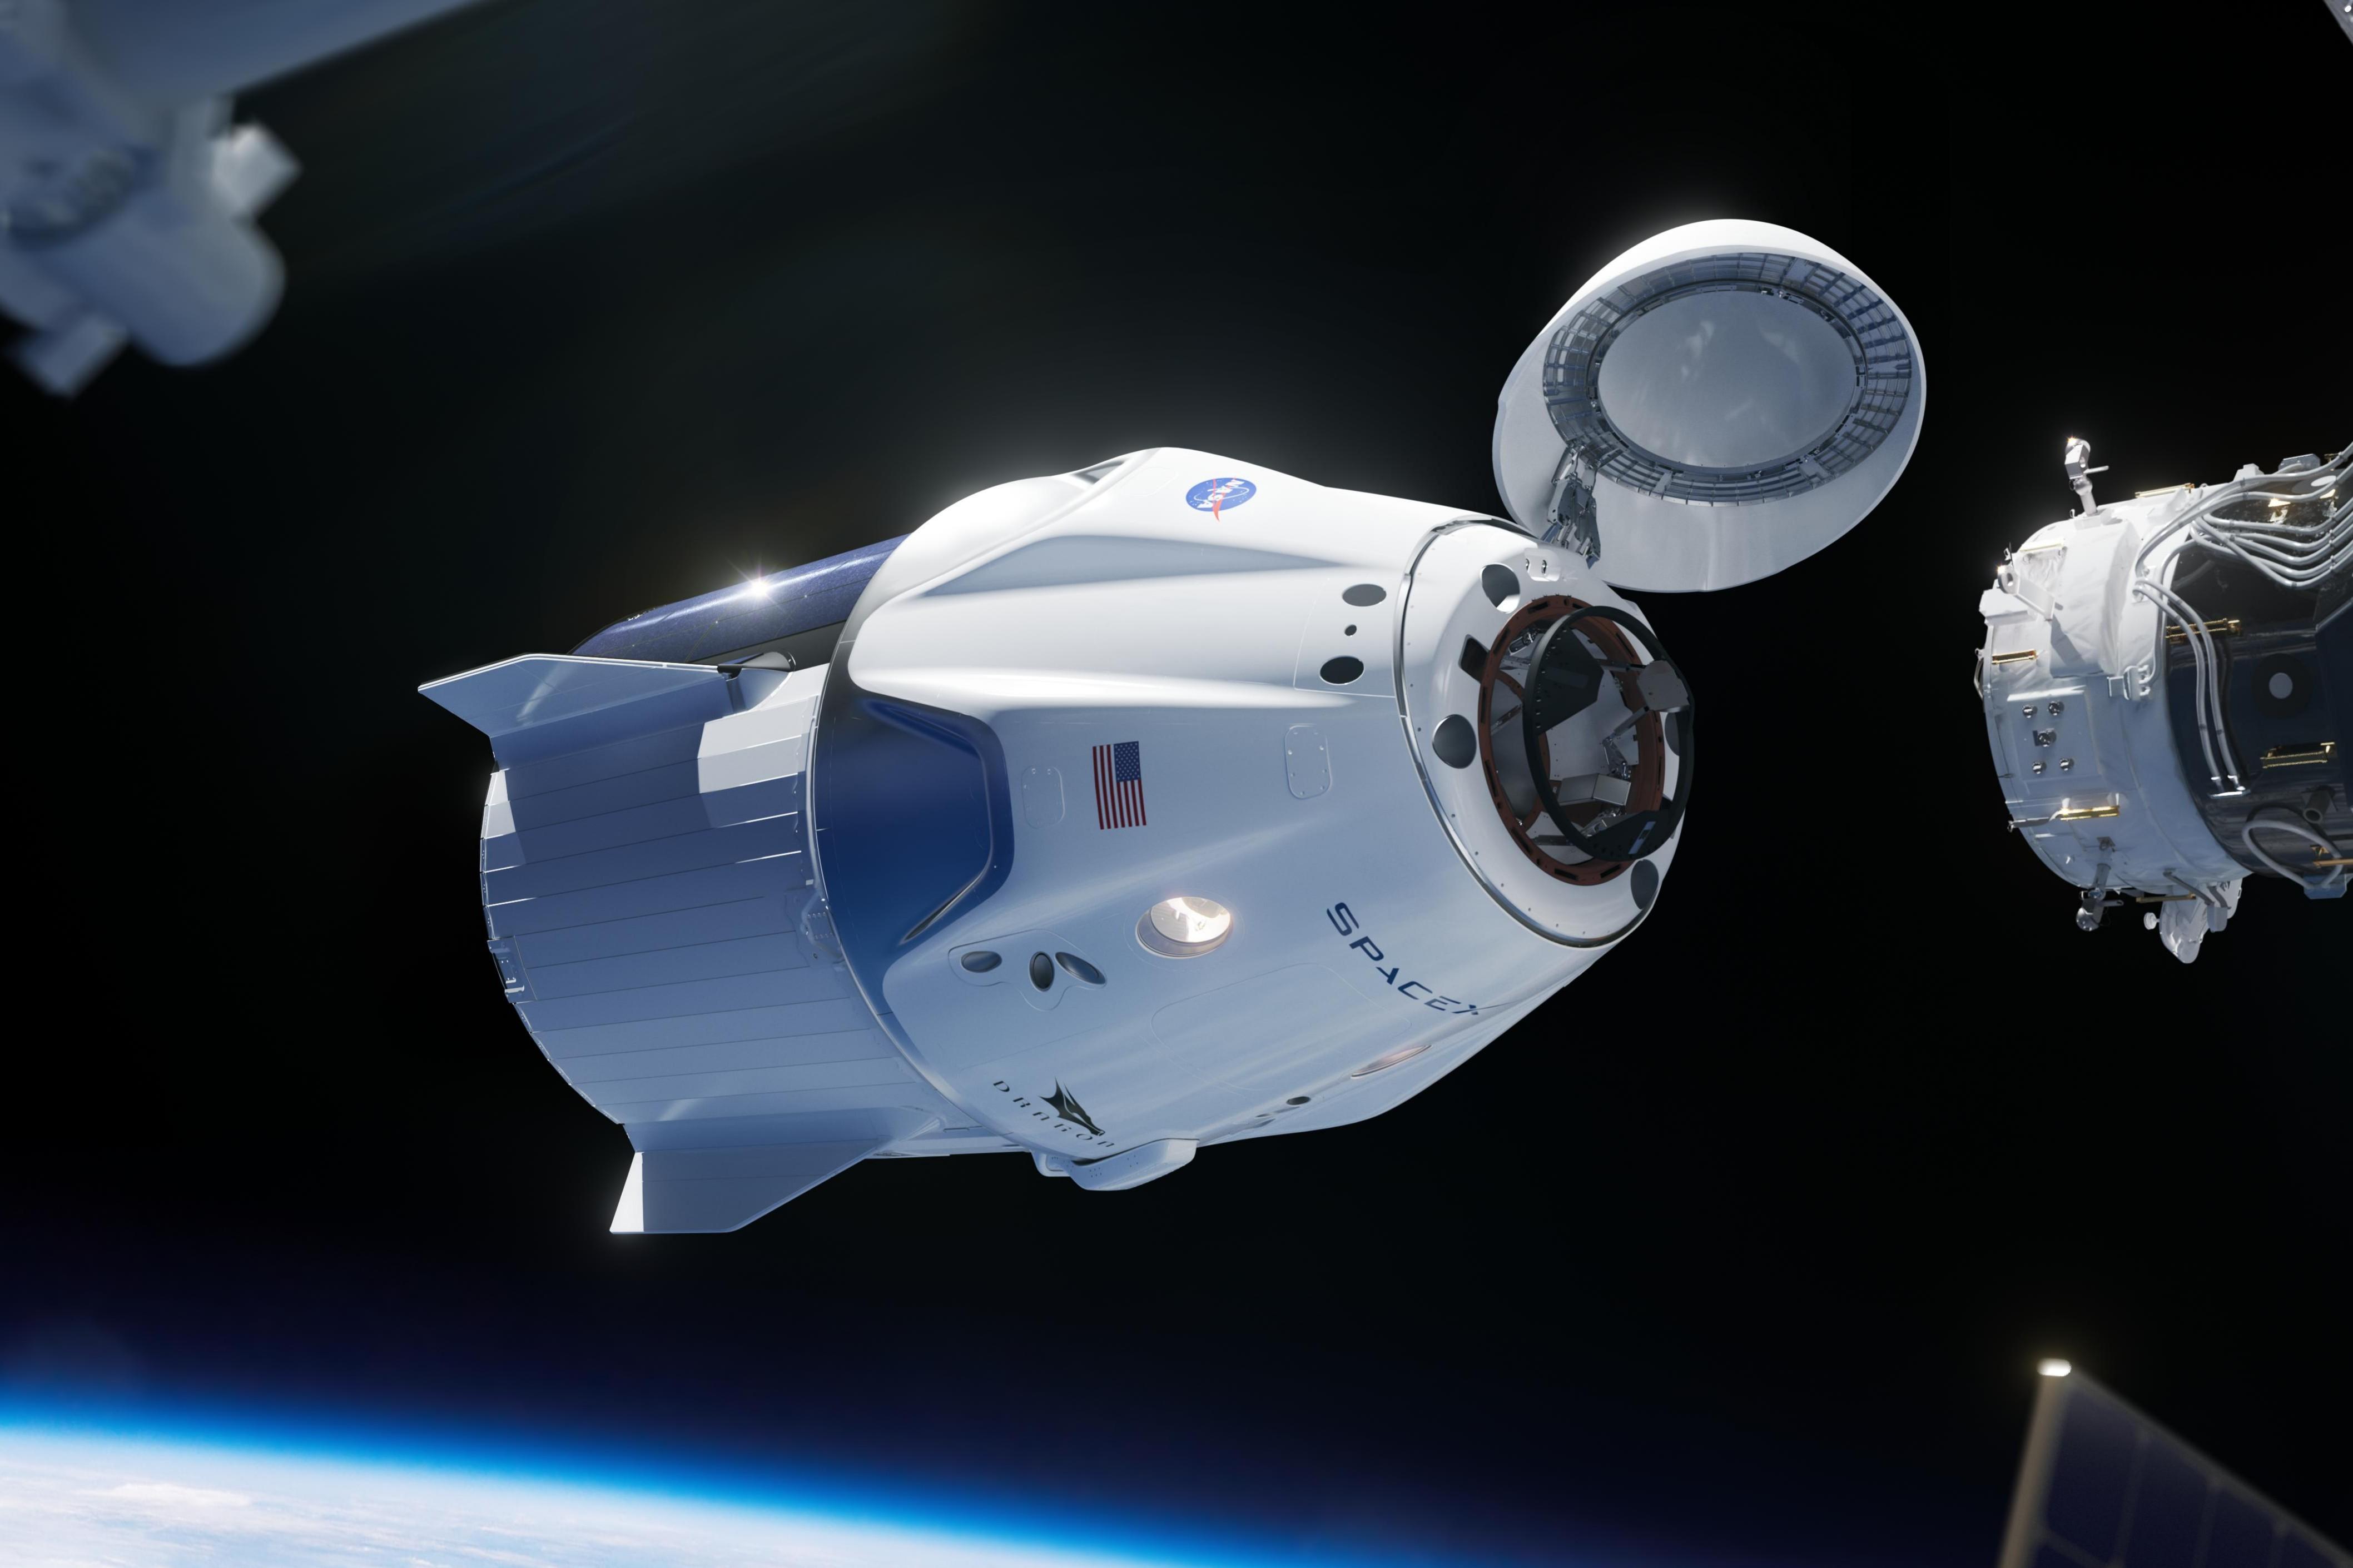 spacex, ruimtetoerisme, crew dragon, ruimte